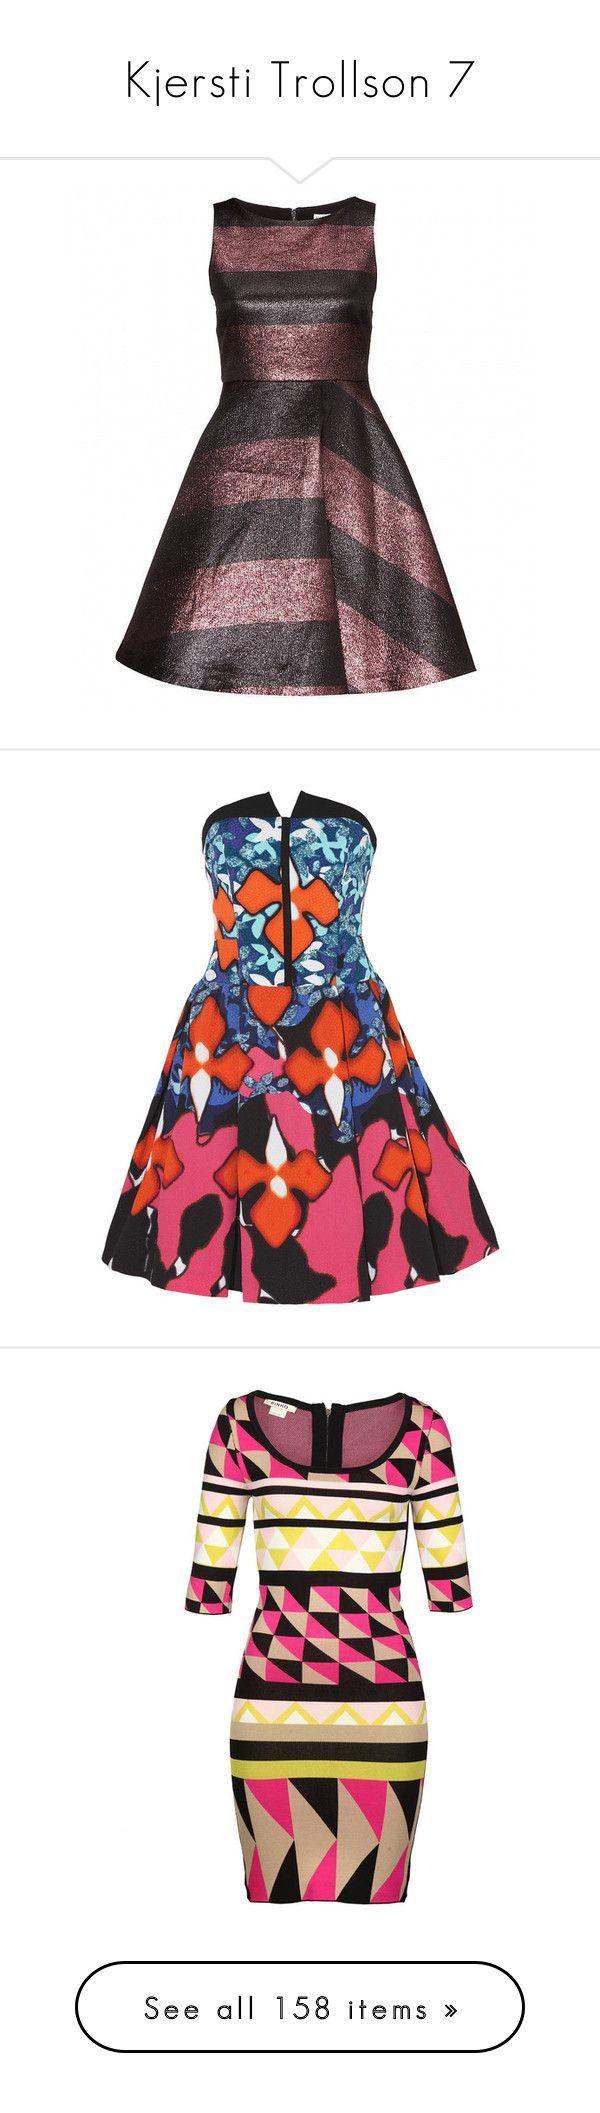 """Kjersti Trollson 7"" by bluetidegirl ❤ liked on Polyvore featuring dresses, vestido, red, floral print dress, red holiday party dress, colorful dresses, red going out dresses, night out dresses, vestidos and multi"